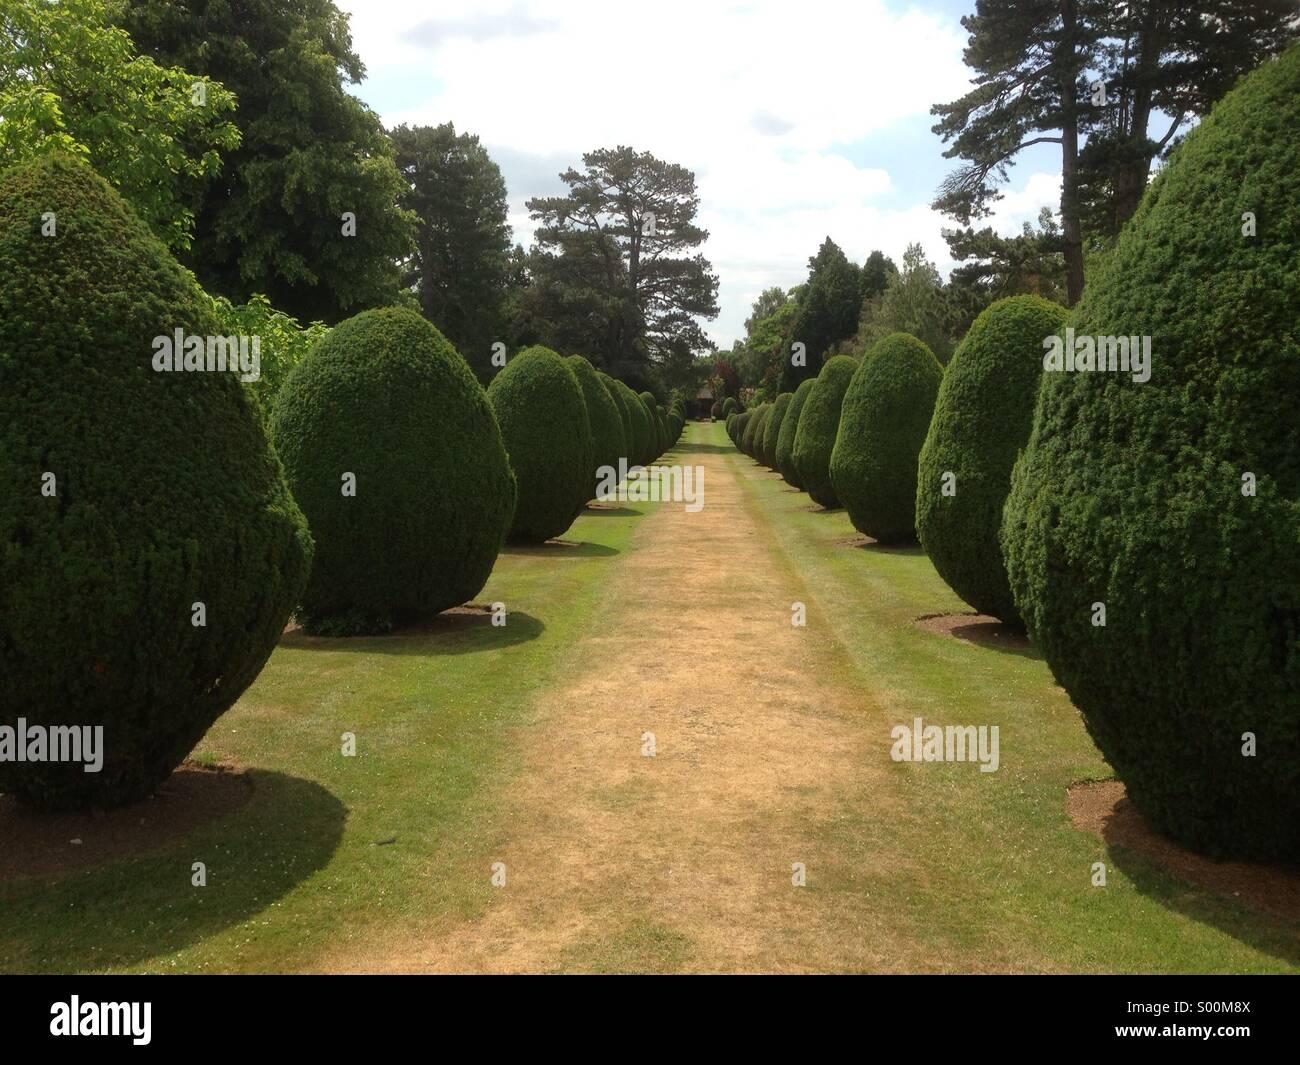 Ornate gardens - Stock Image